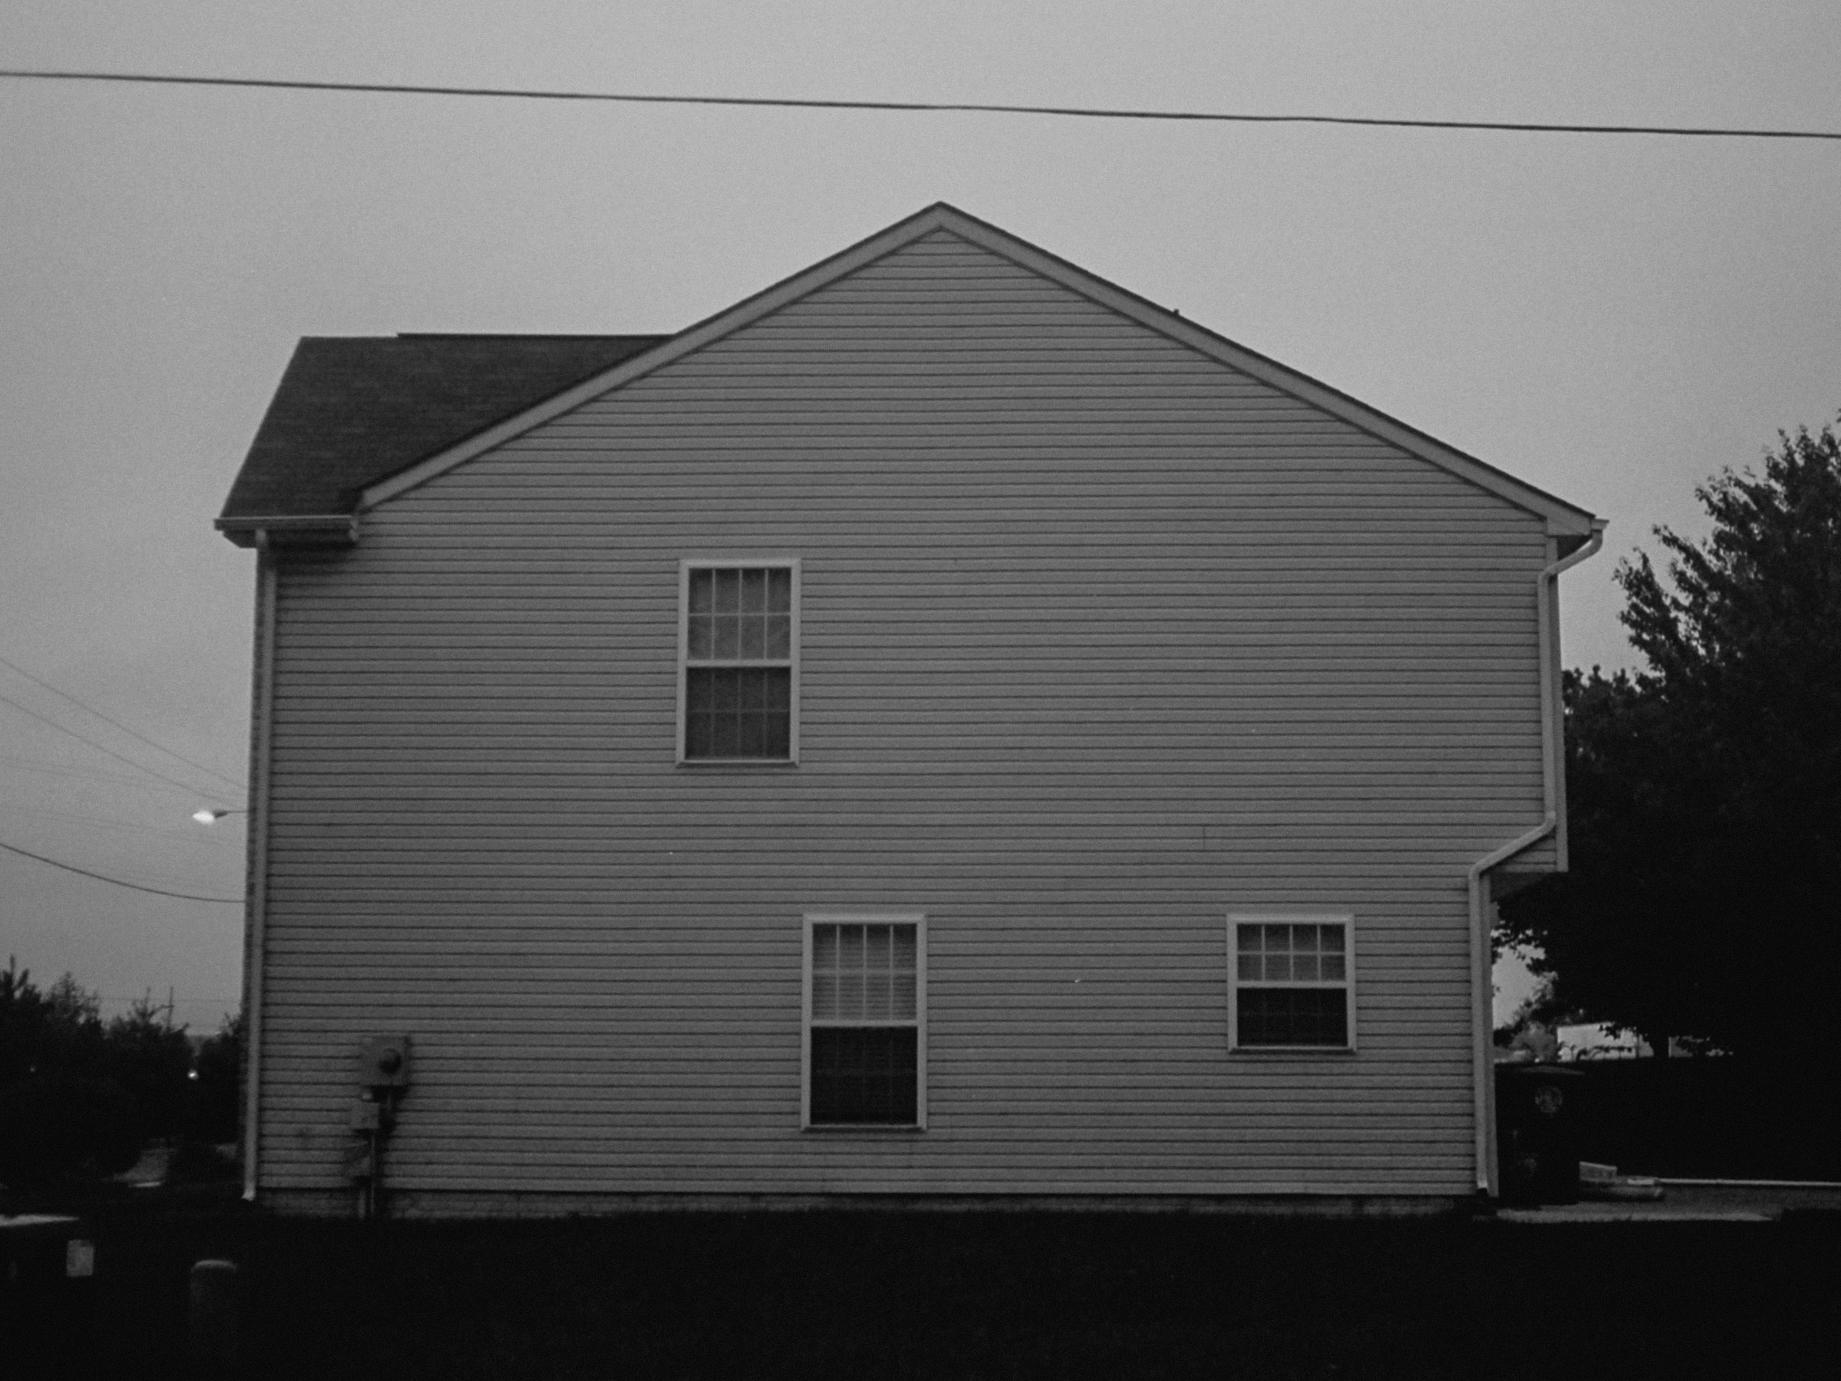 MarylandBackOfHouse_1.jpg